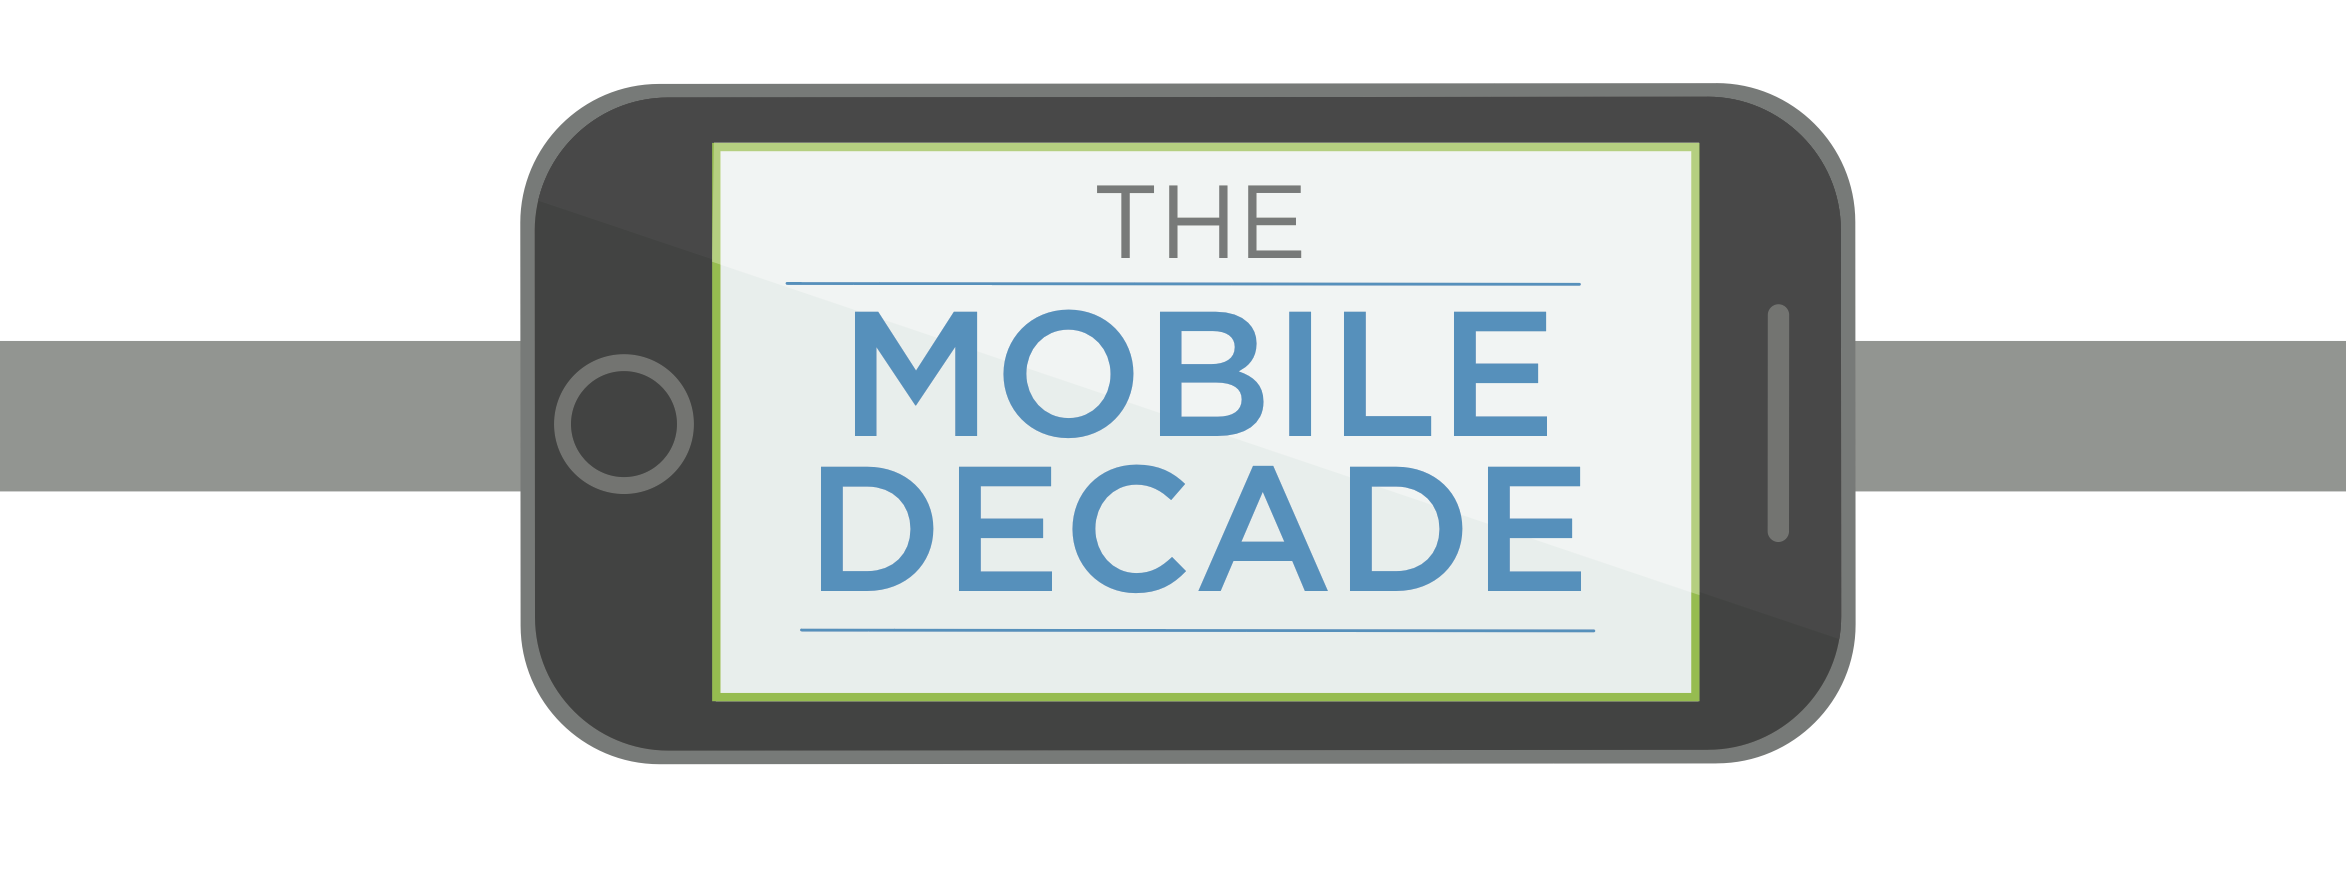 mobiledecade10Cropped